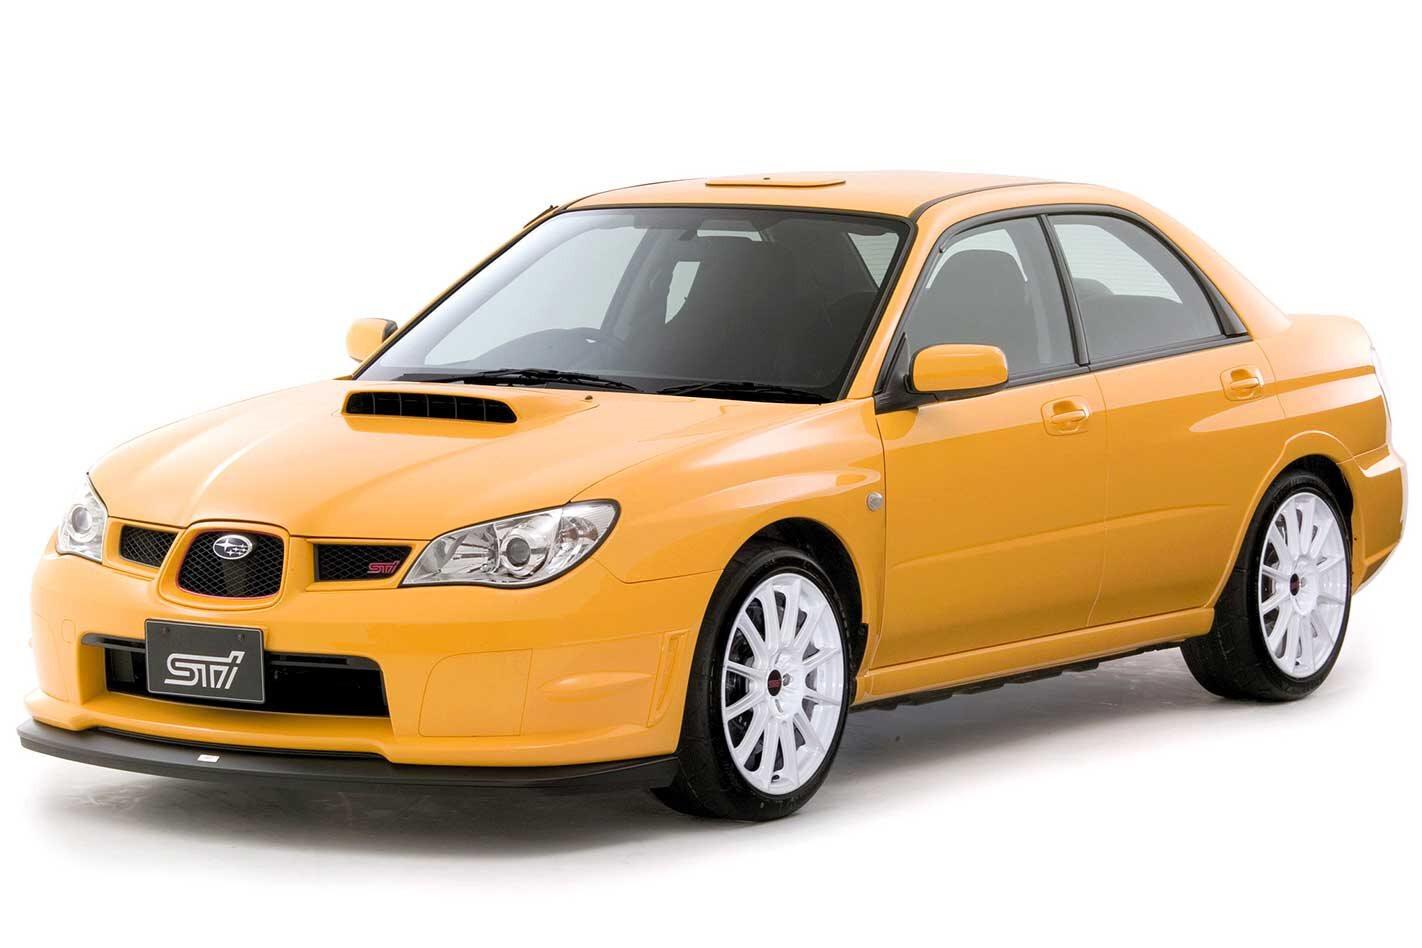 2007 Subaru Impreza WRX STI Spec C RA-R Fast Car History Lesson